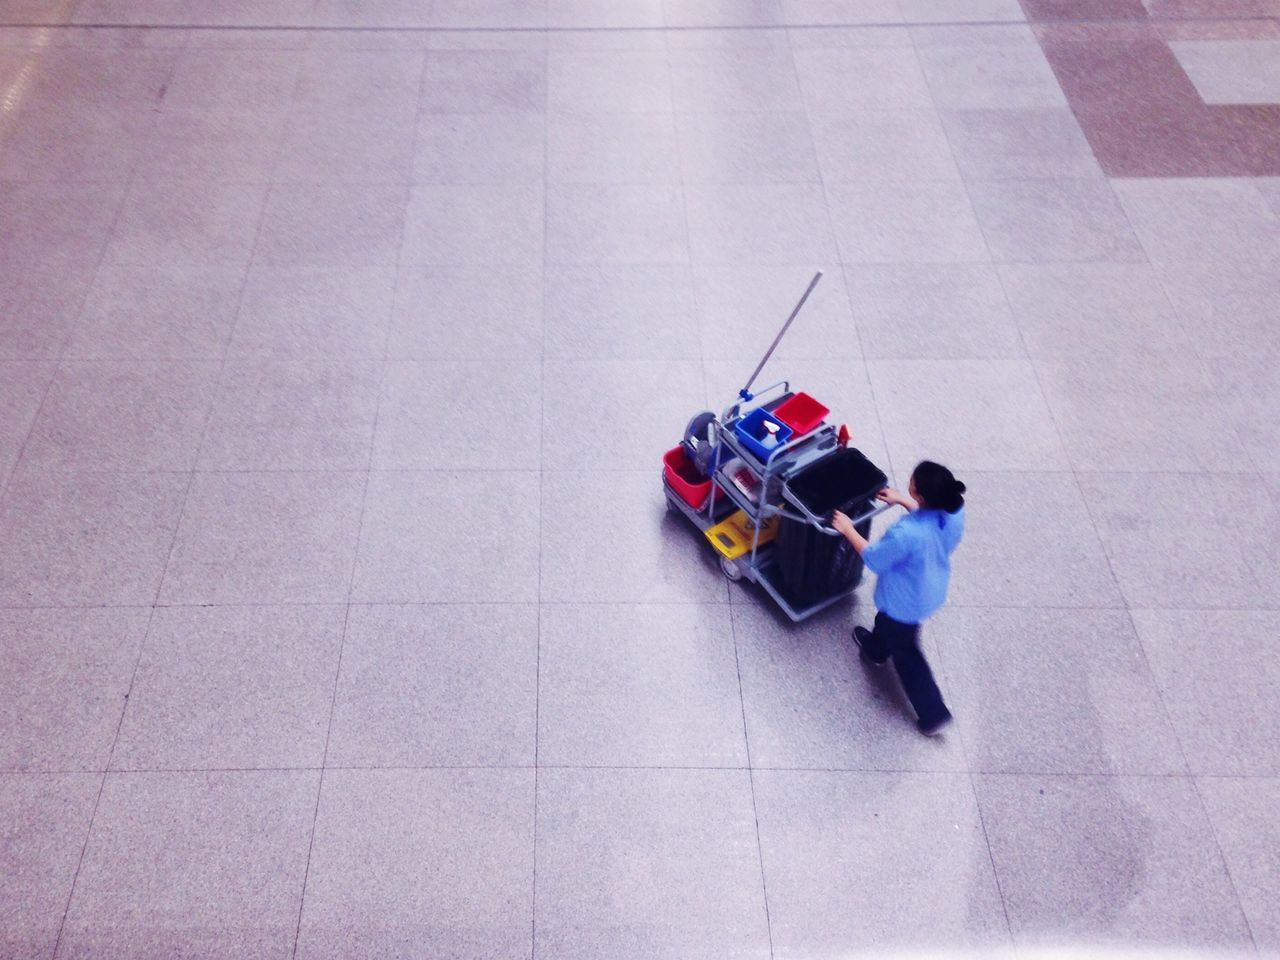 High angle view of female caretaker pushing cart at airport